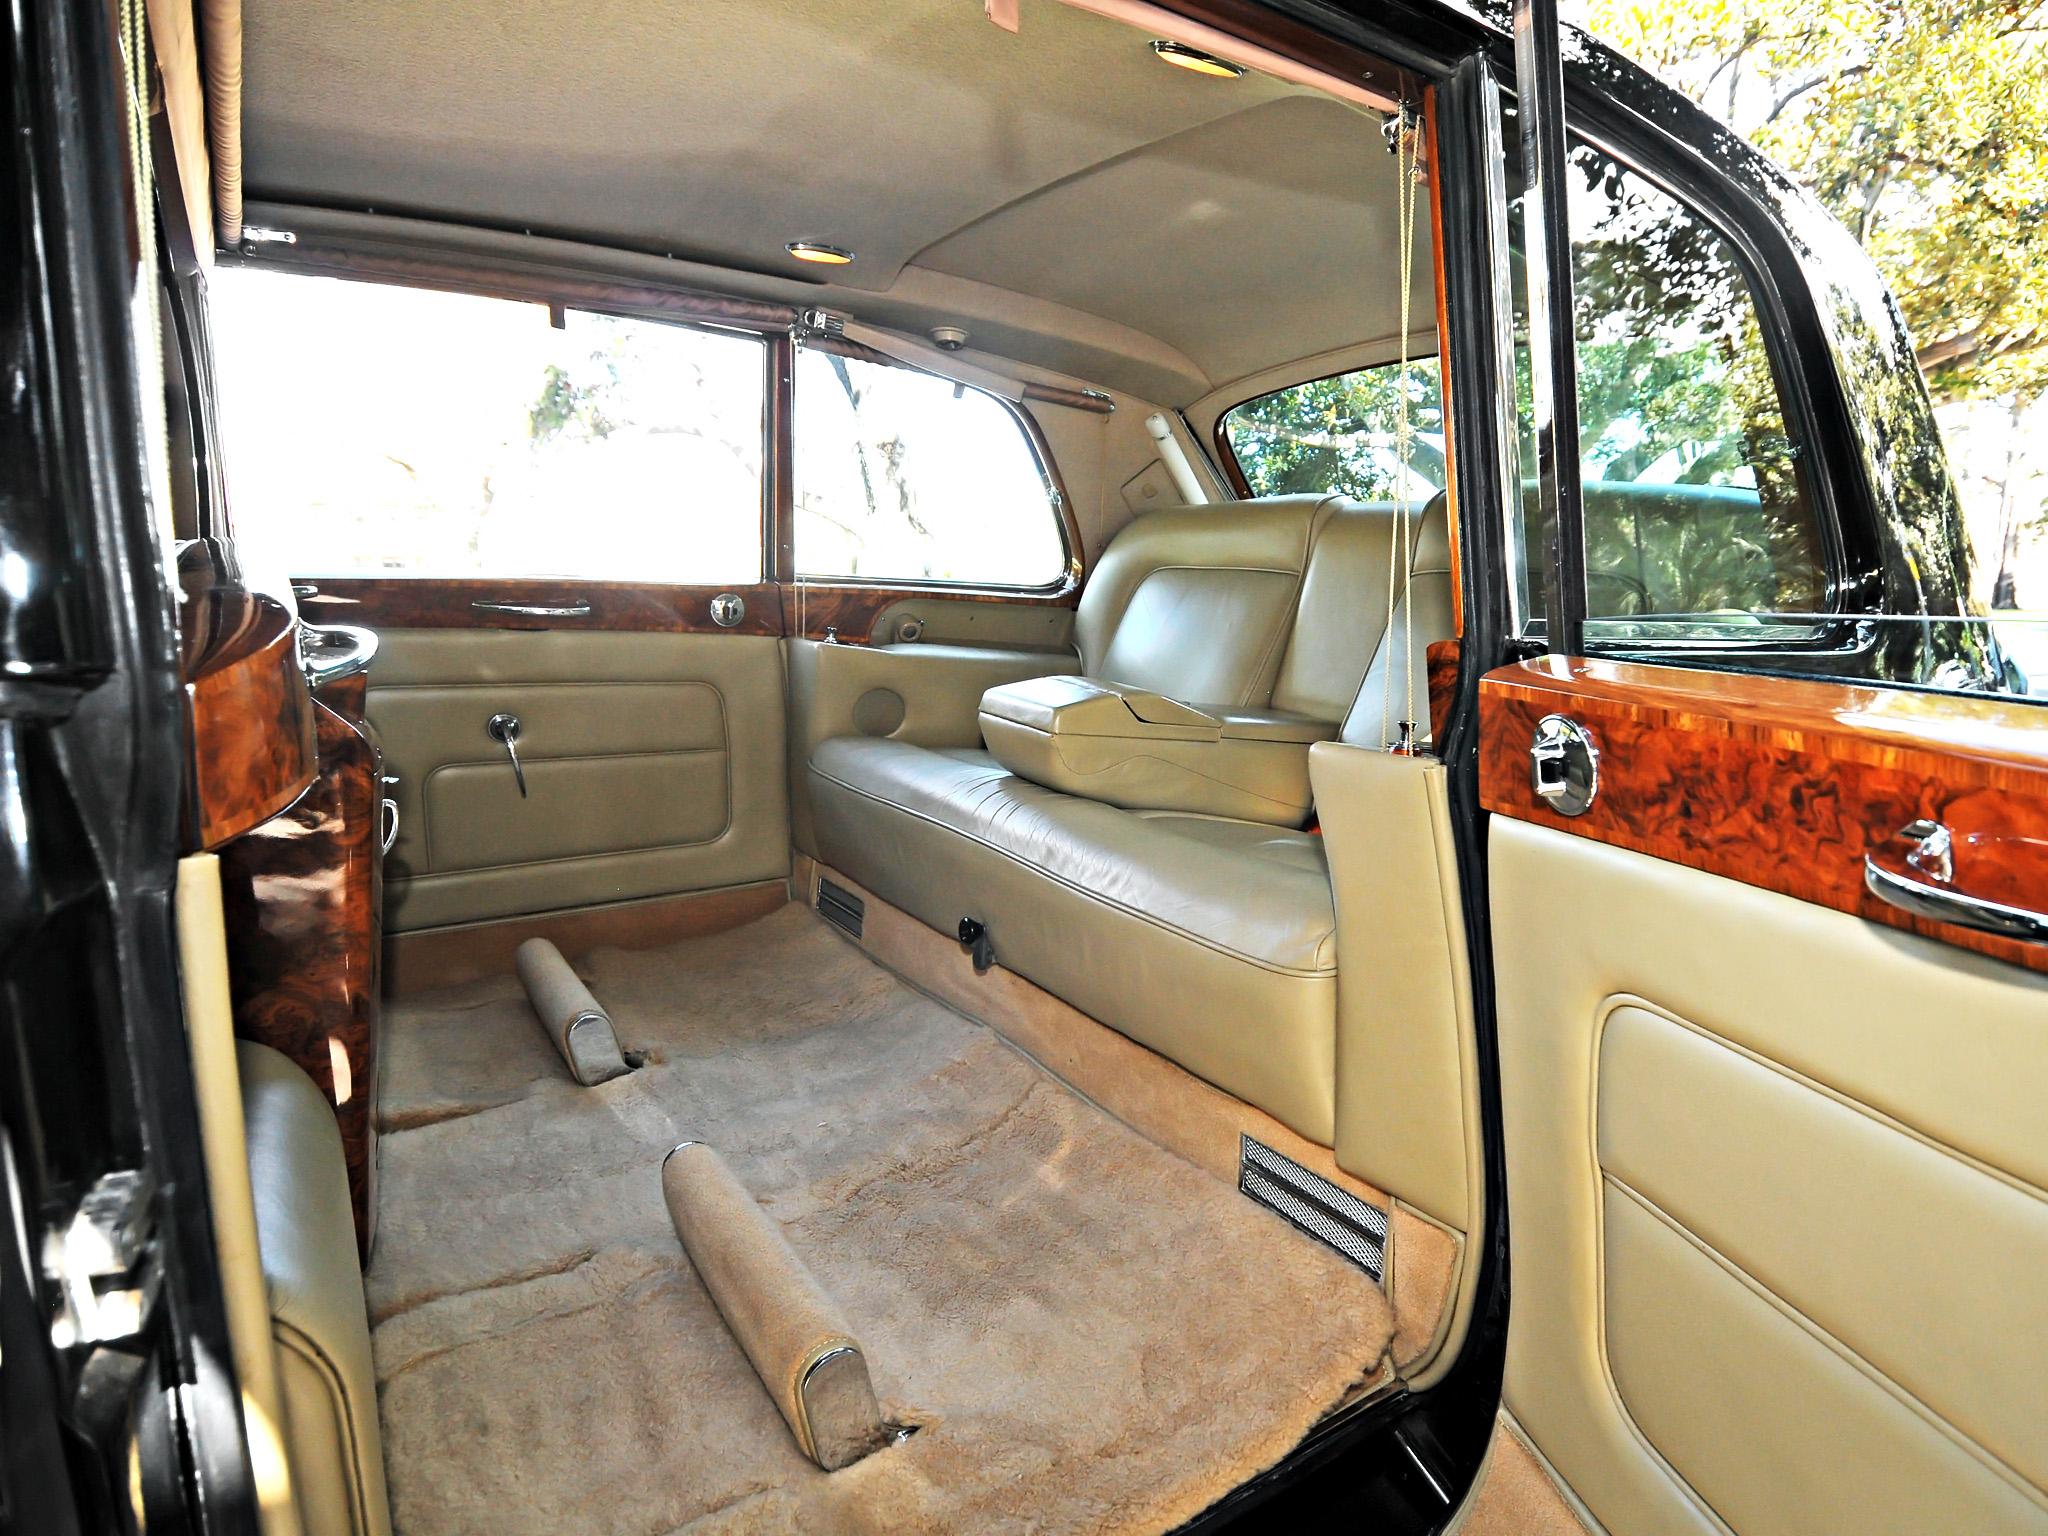 1963 rolls royce phantom v park ward limousine luxury classic interior f wallpaper 2048x1536. Black Bedroom Furniture Sets. Home Design Ideas